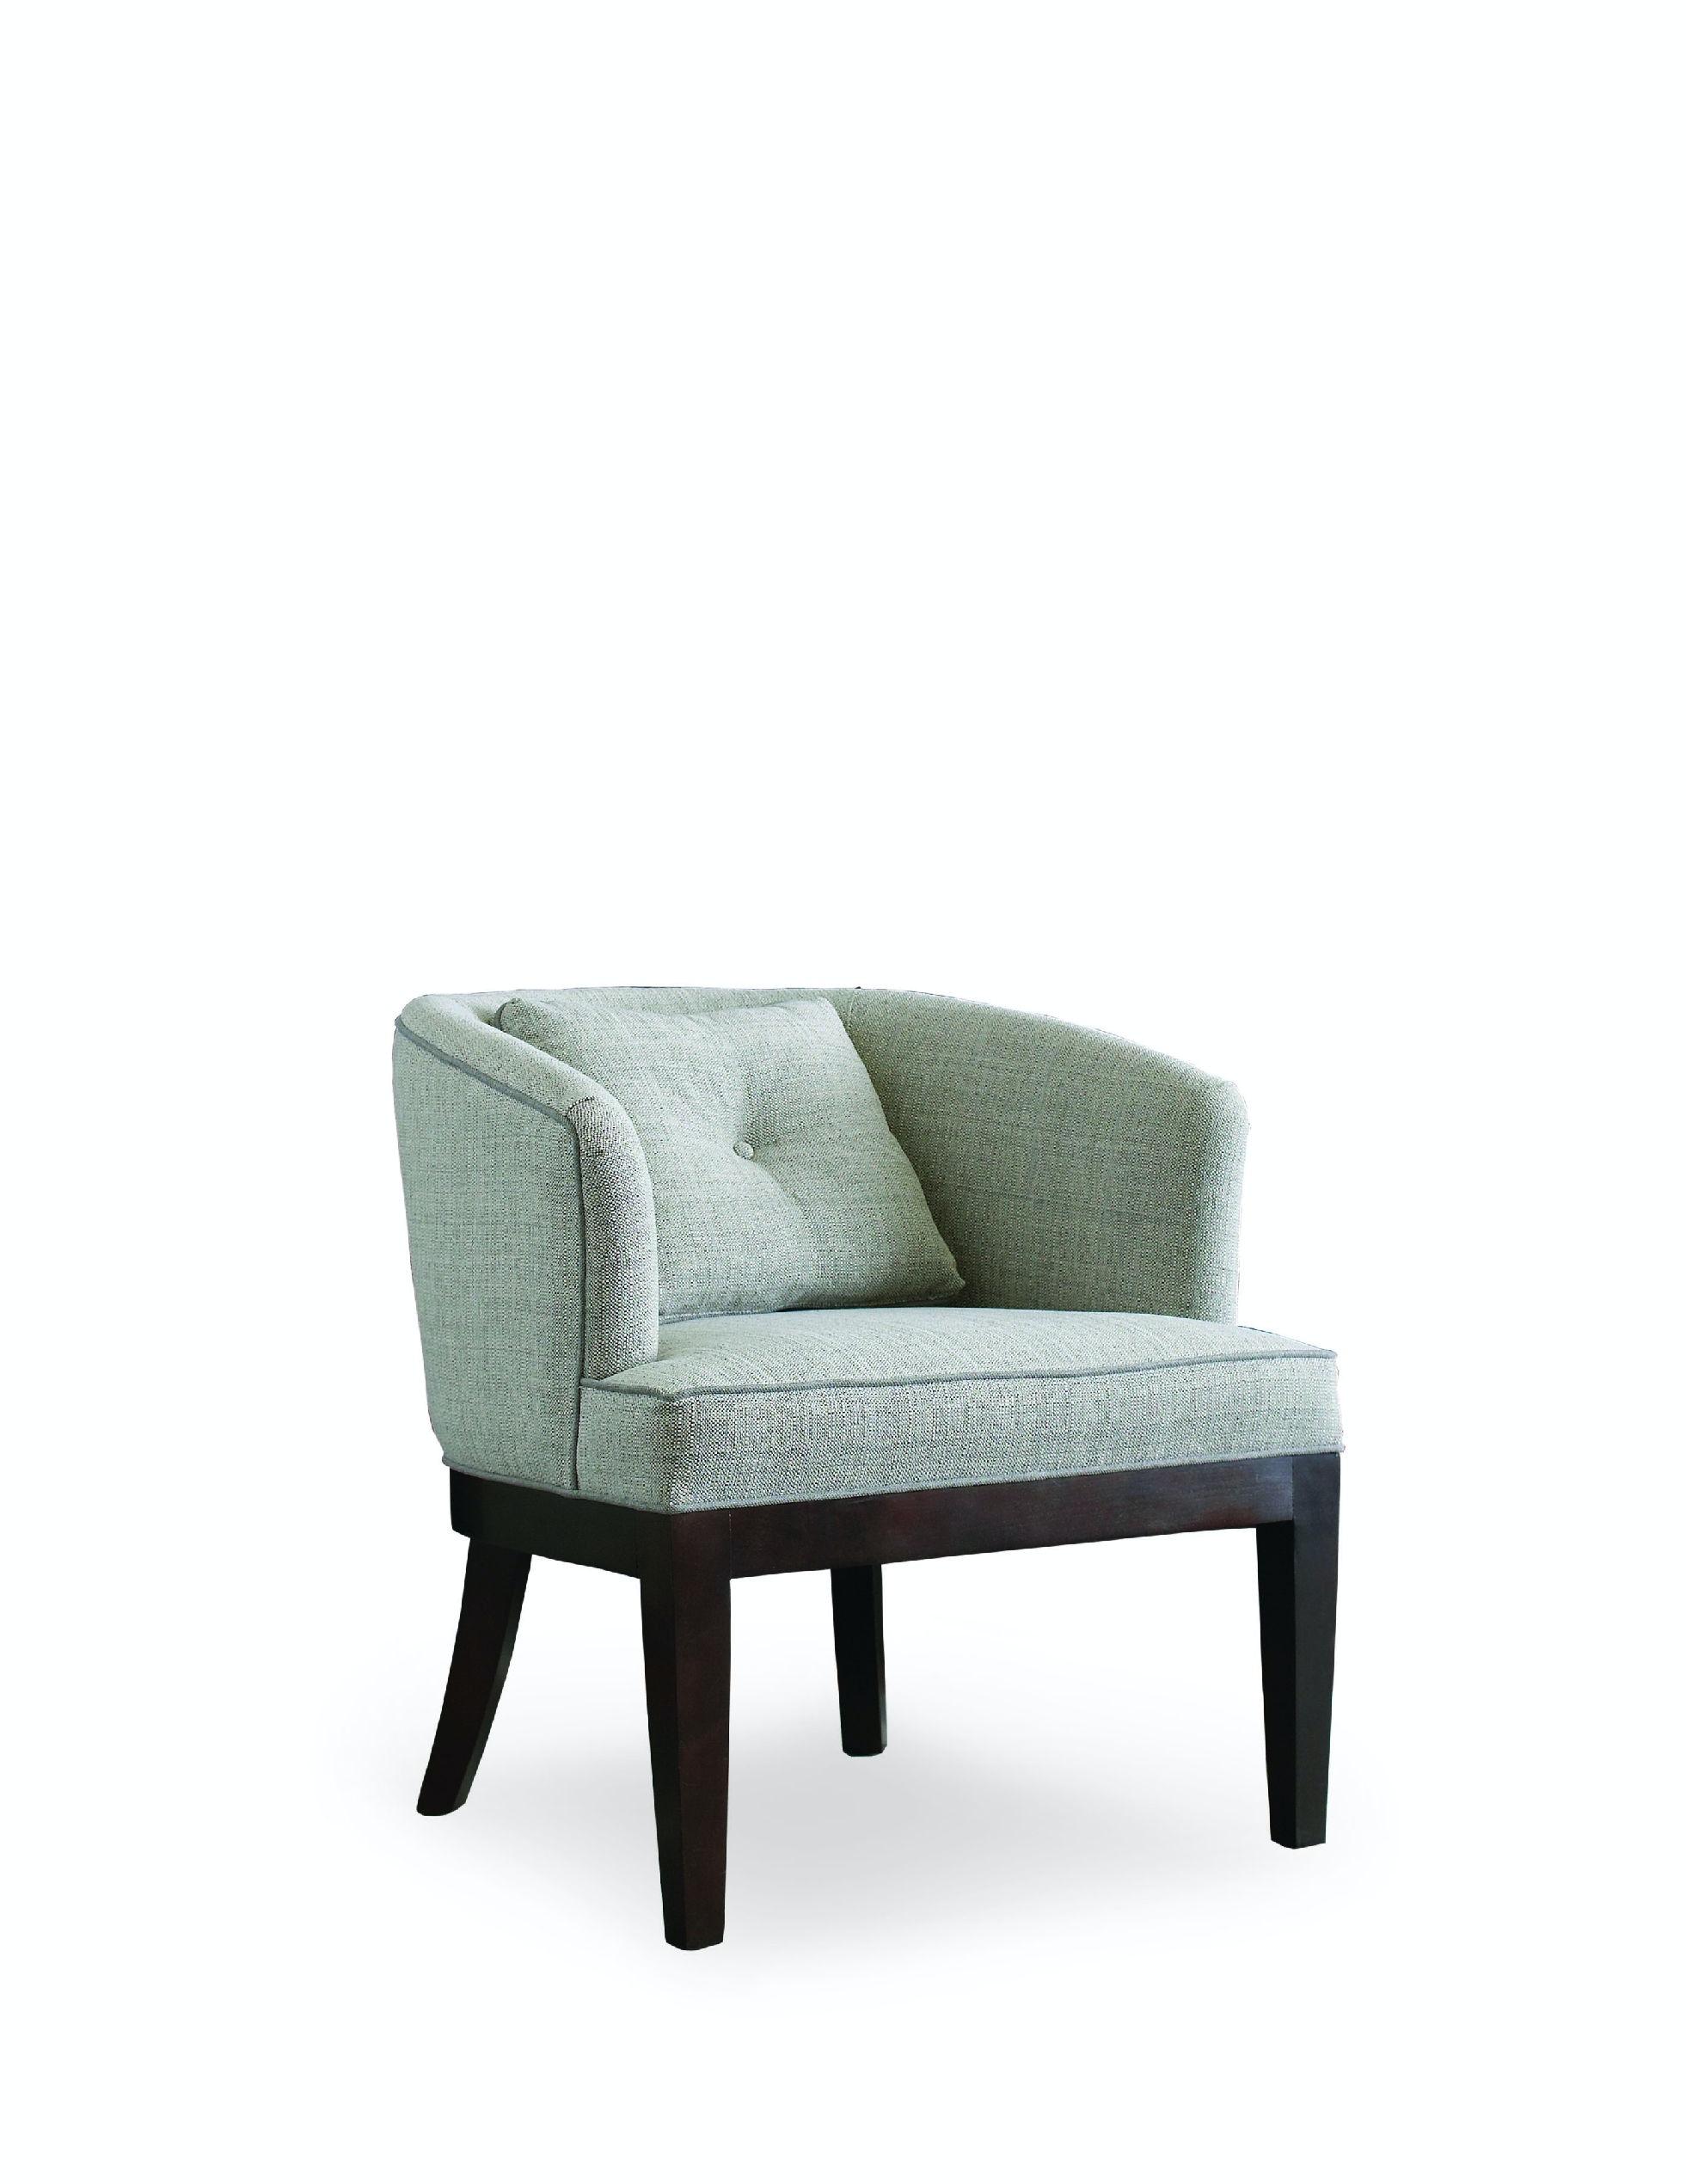 Captivating Braxton Culler Dersden Chair 5013 001